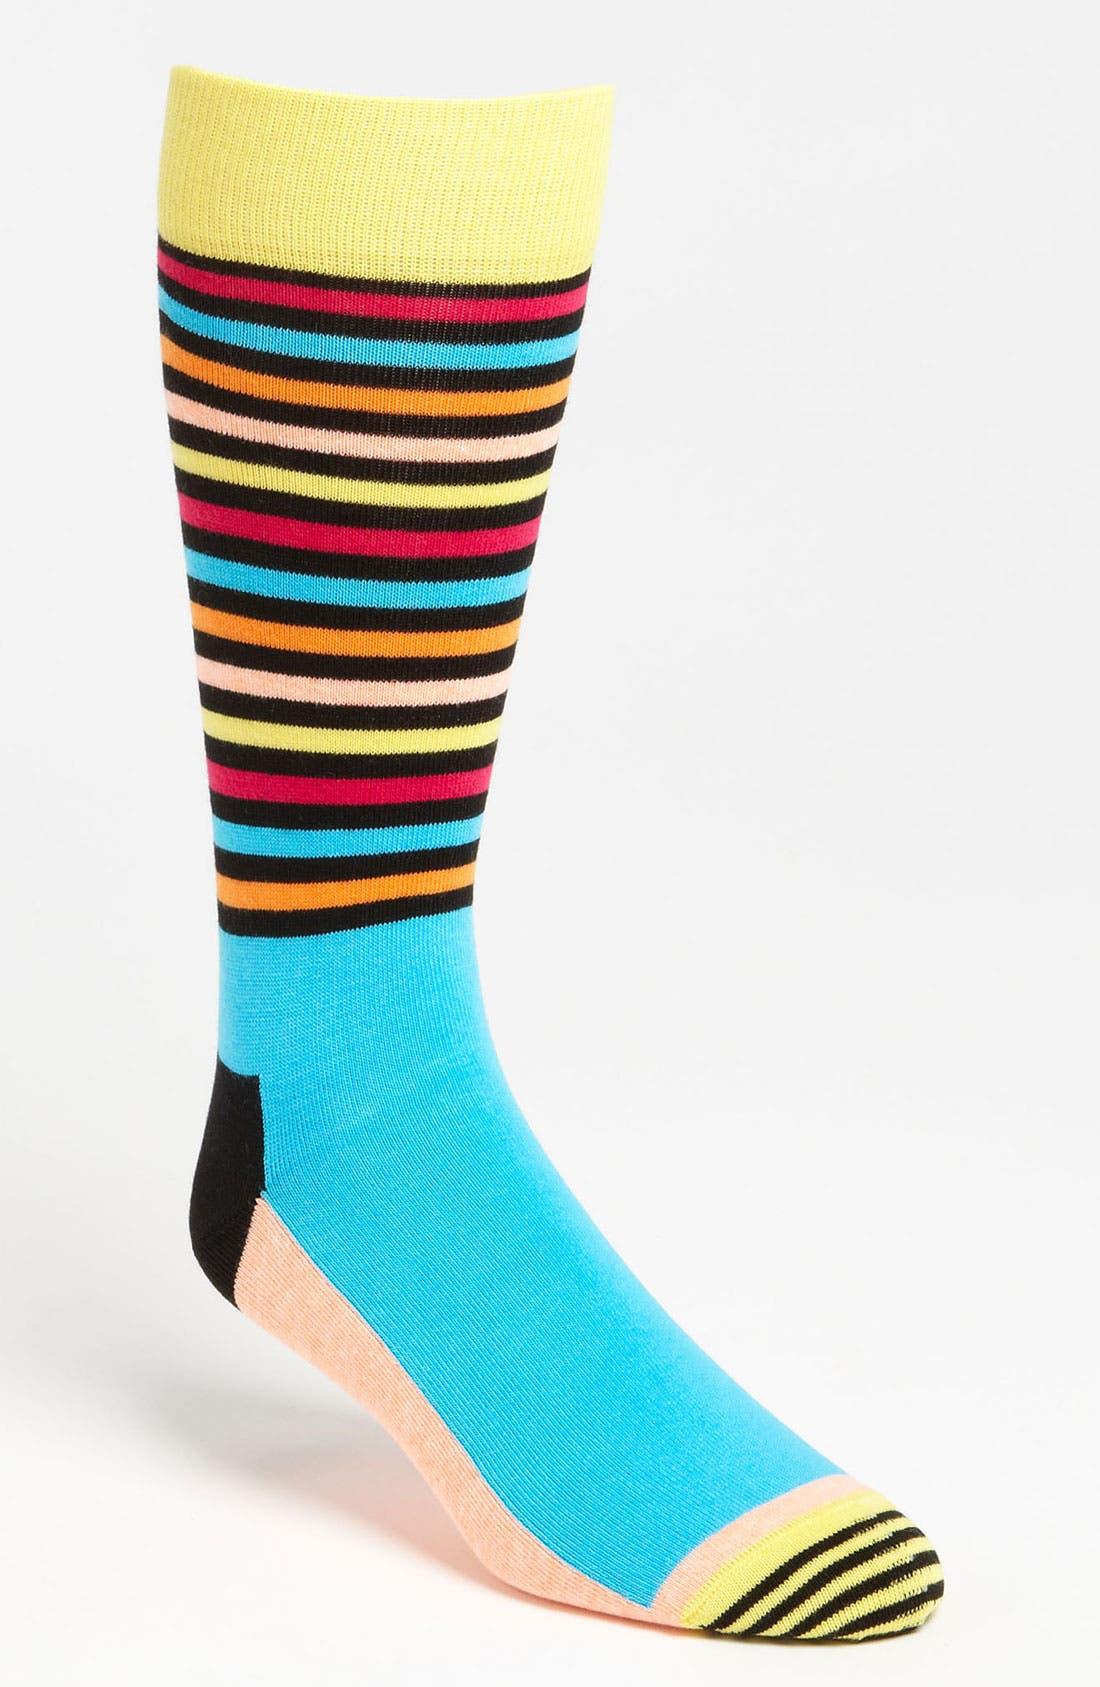 Alternate Image 1 Selected - Happy Socks Patterned Cotton Blend Socks